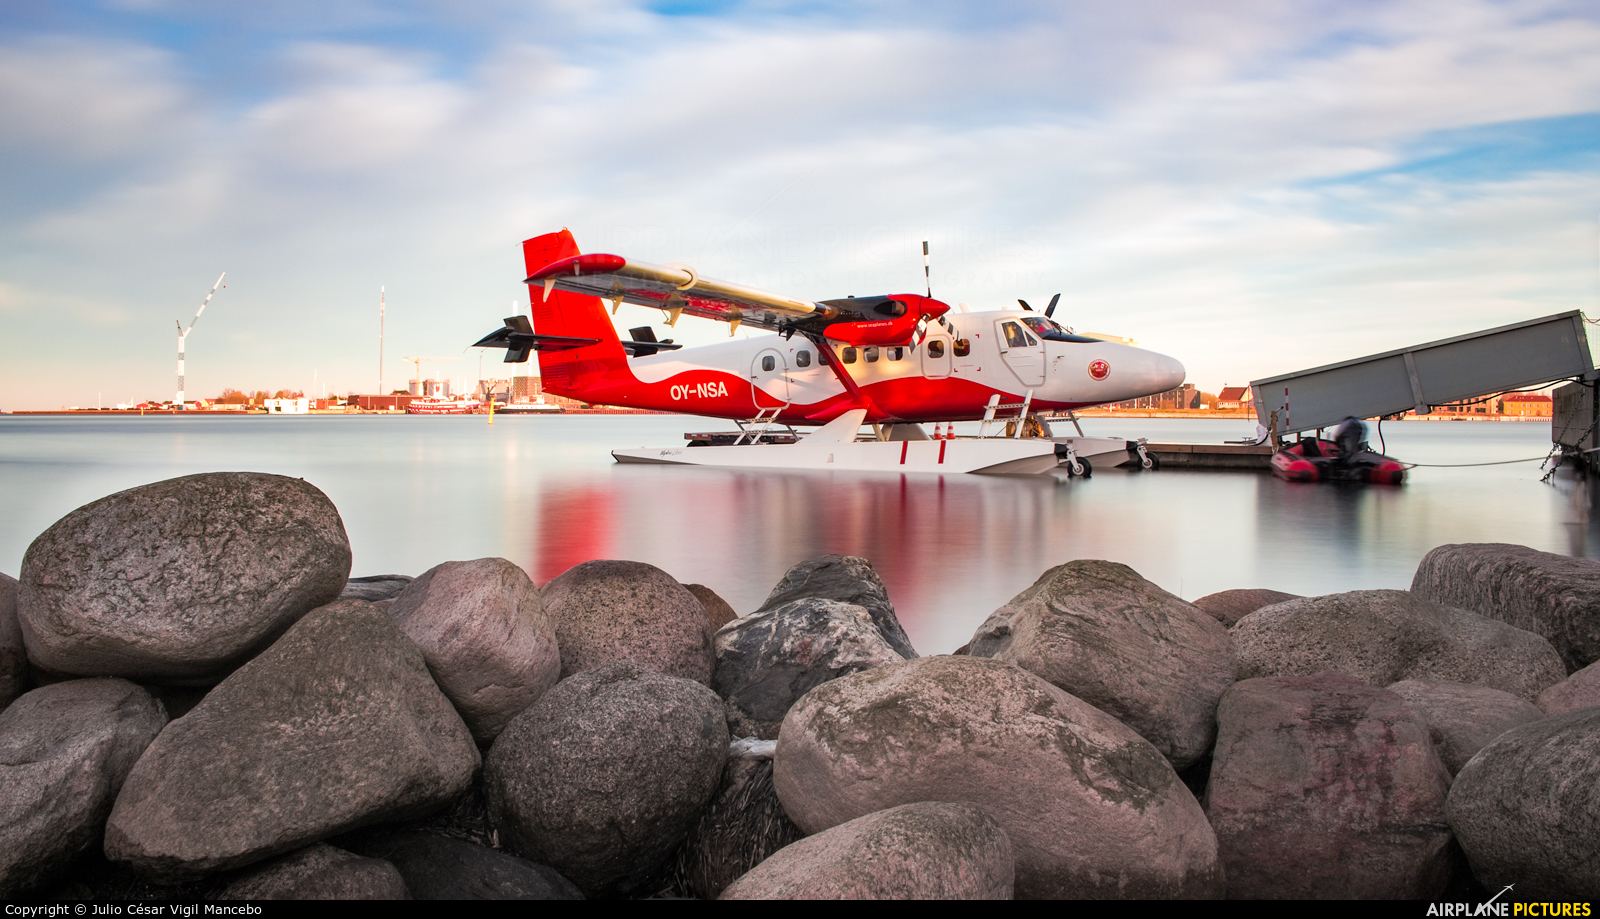 Nordic Seaplanes OY-NSA aircraft at Copenhagen harbour sea airport